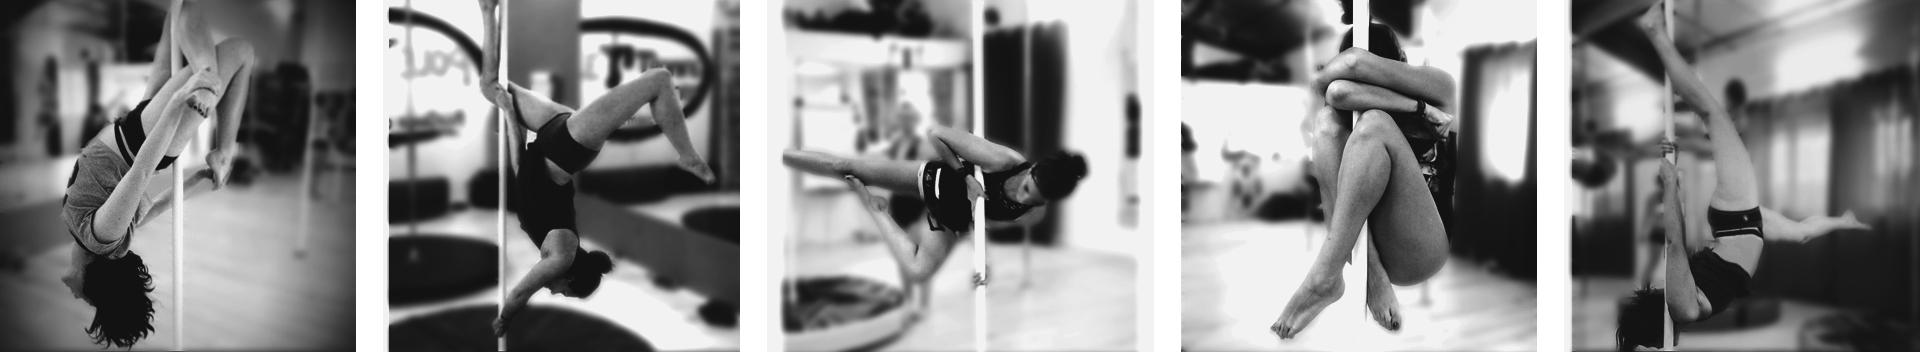 SAUVAZINE-entete-pole-dance3